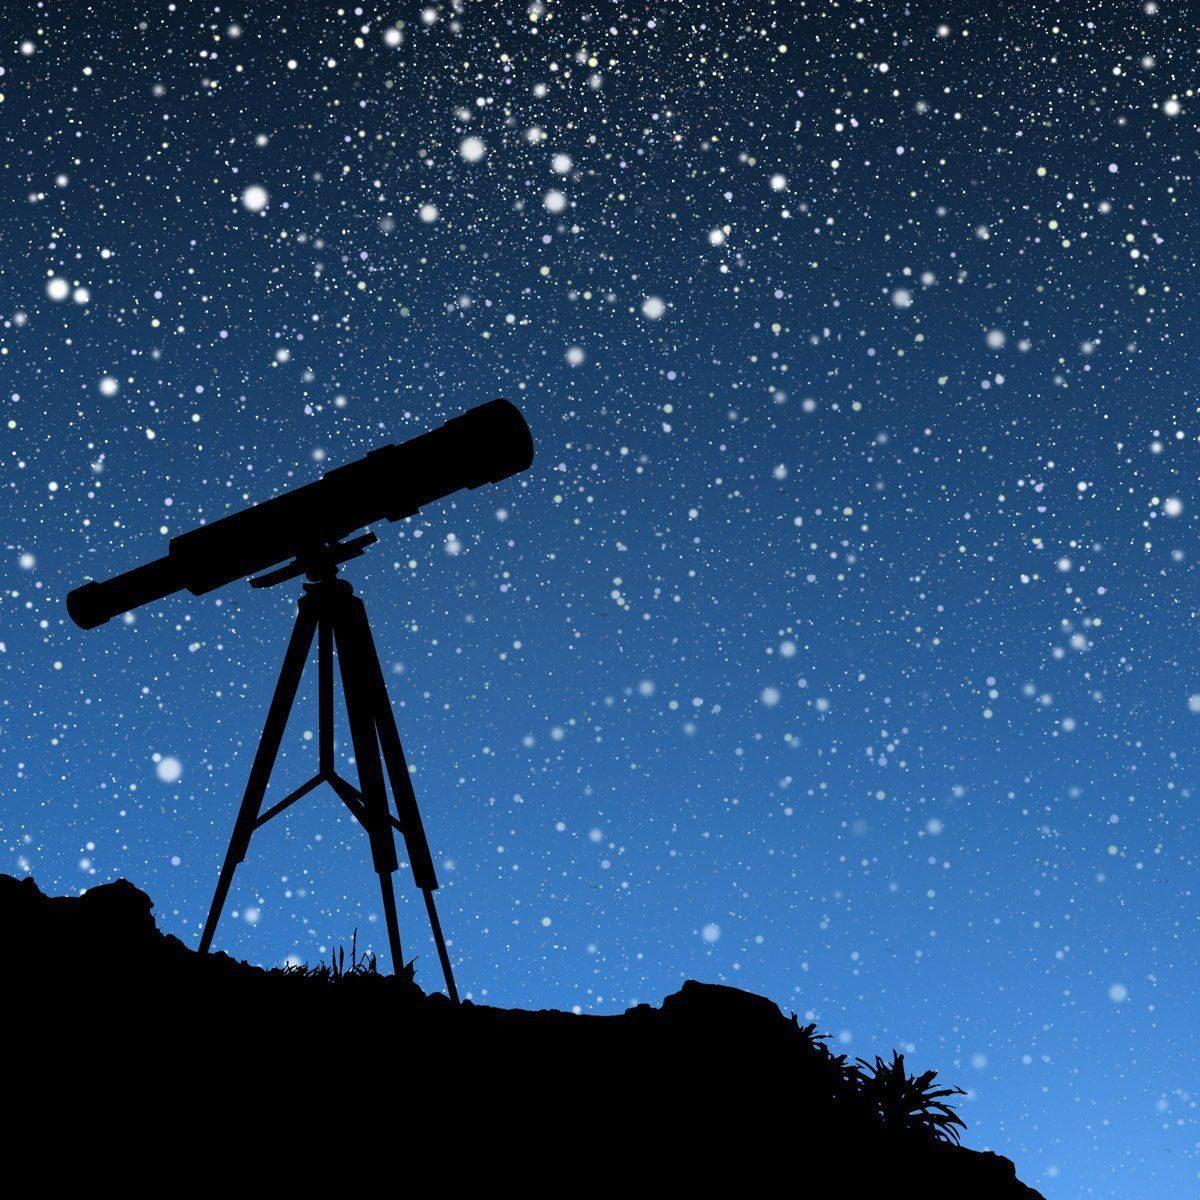 8 inch dobsonian telescopes